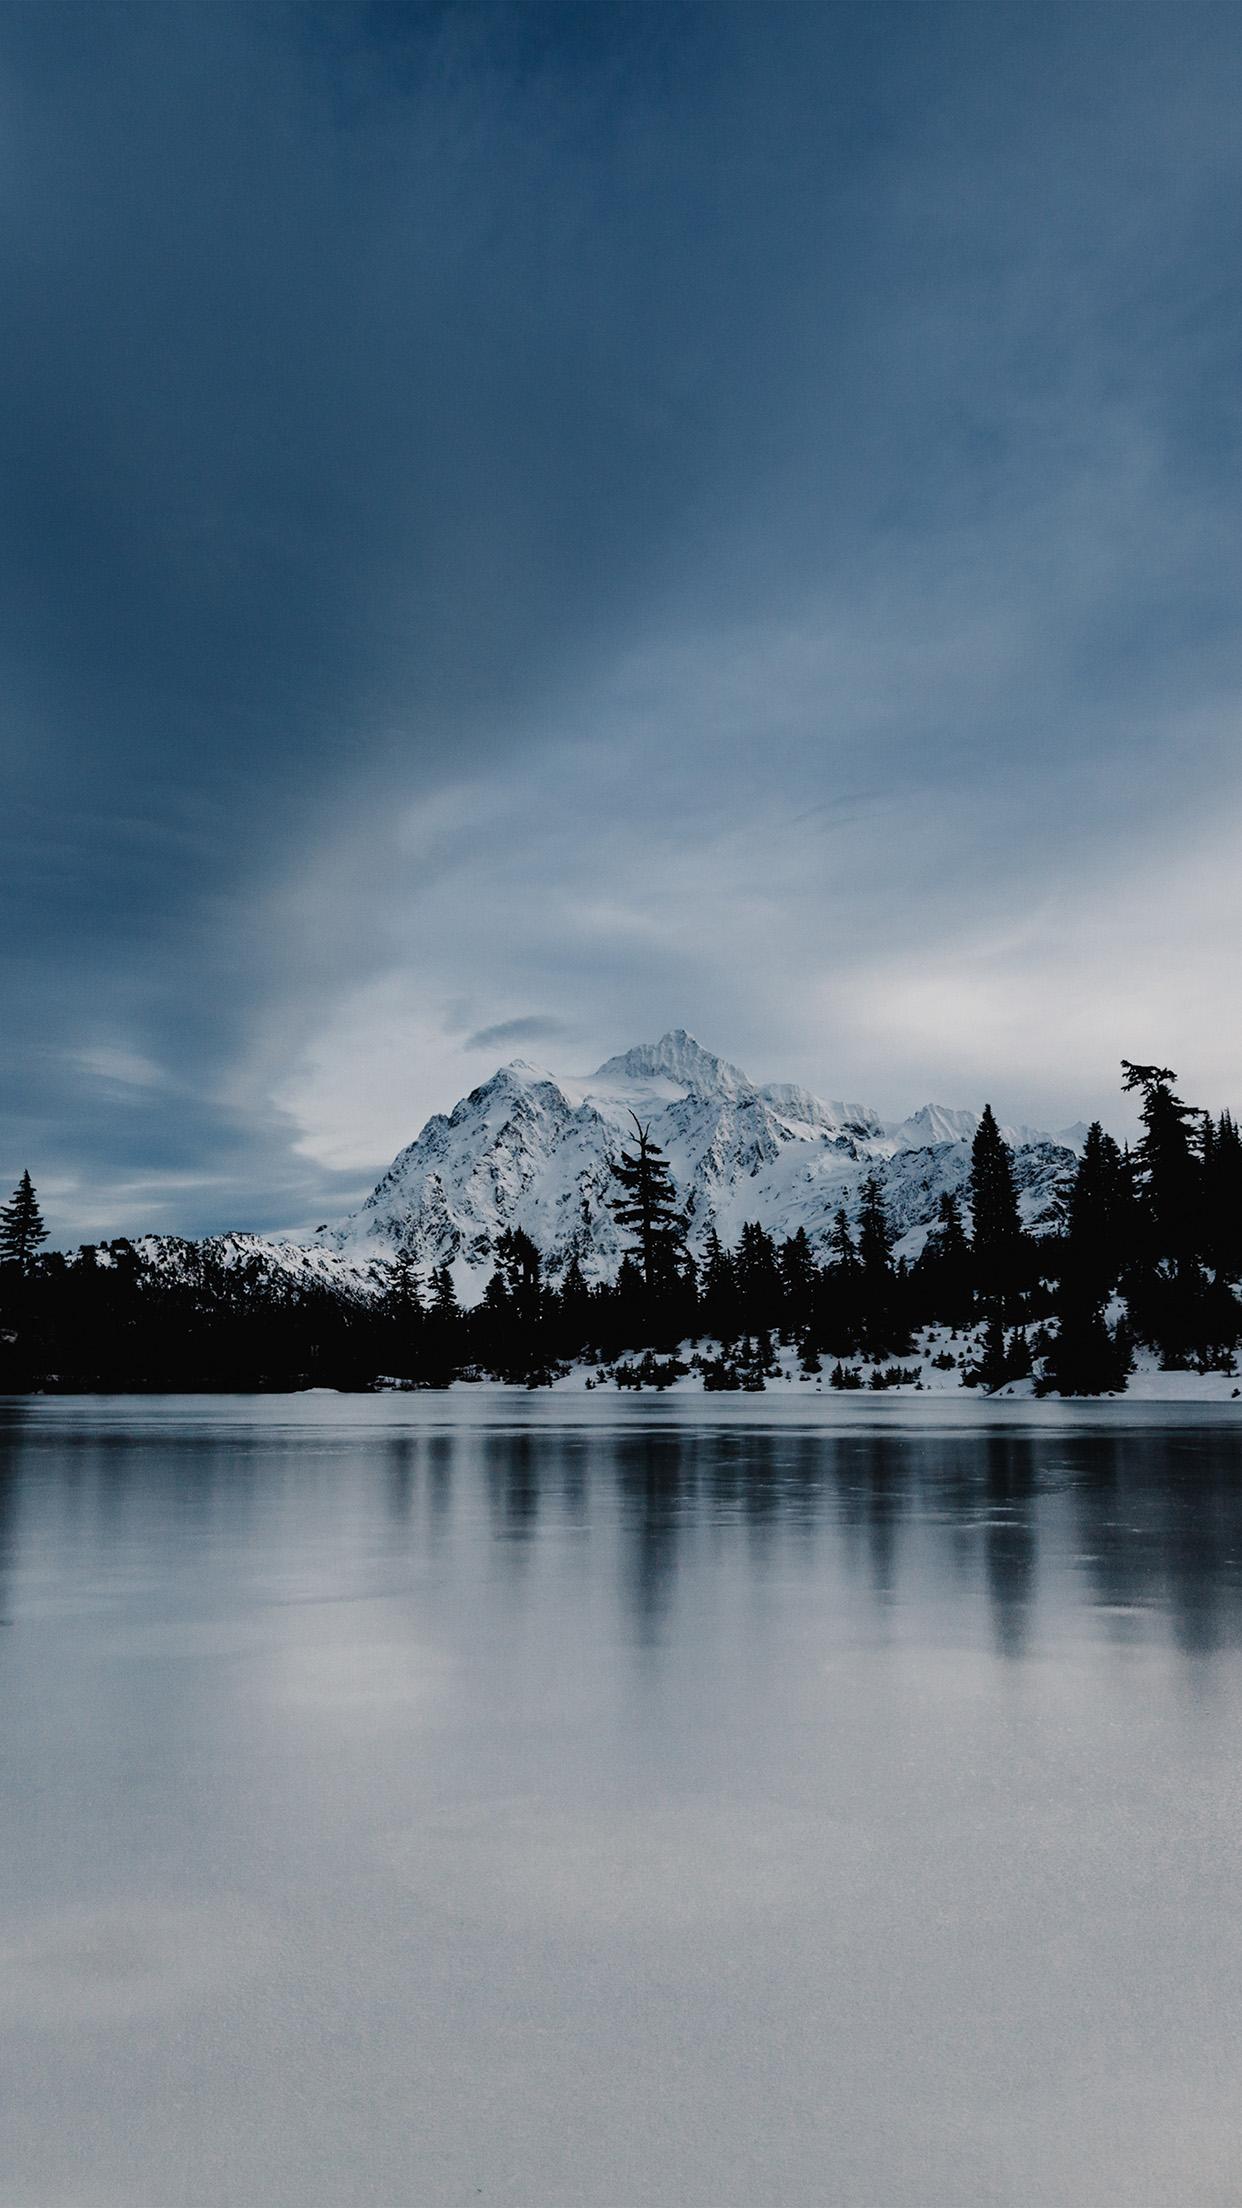 Fall Lake Wallpaper Papers Co Iphone Wallpaper Ni37 Frozen Lake Winter